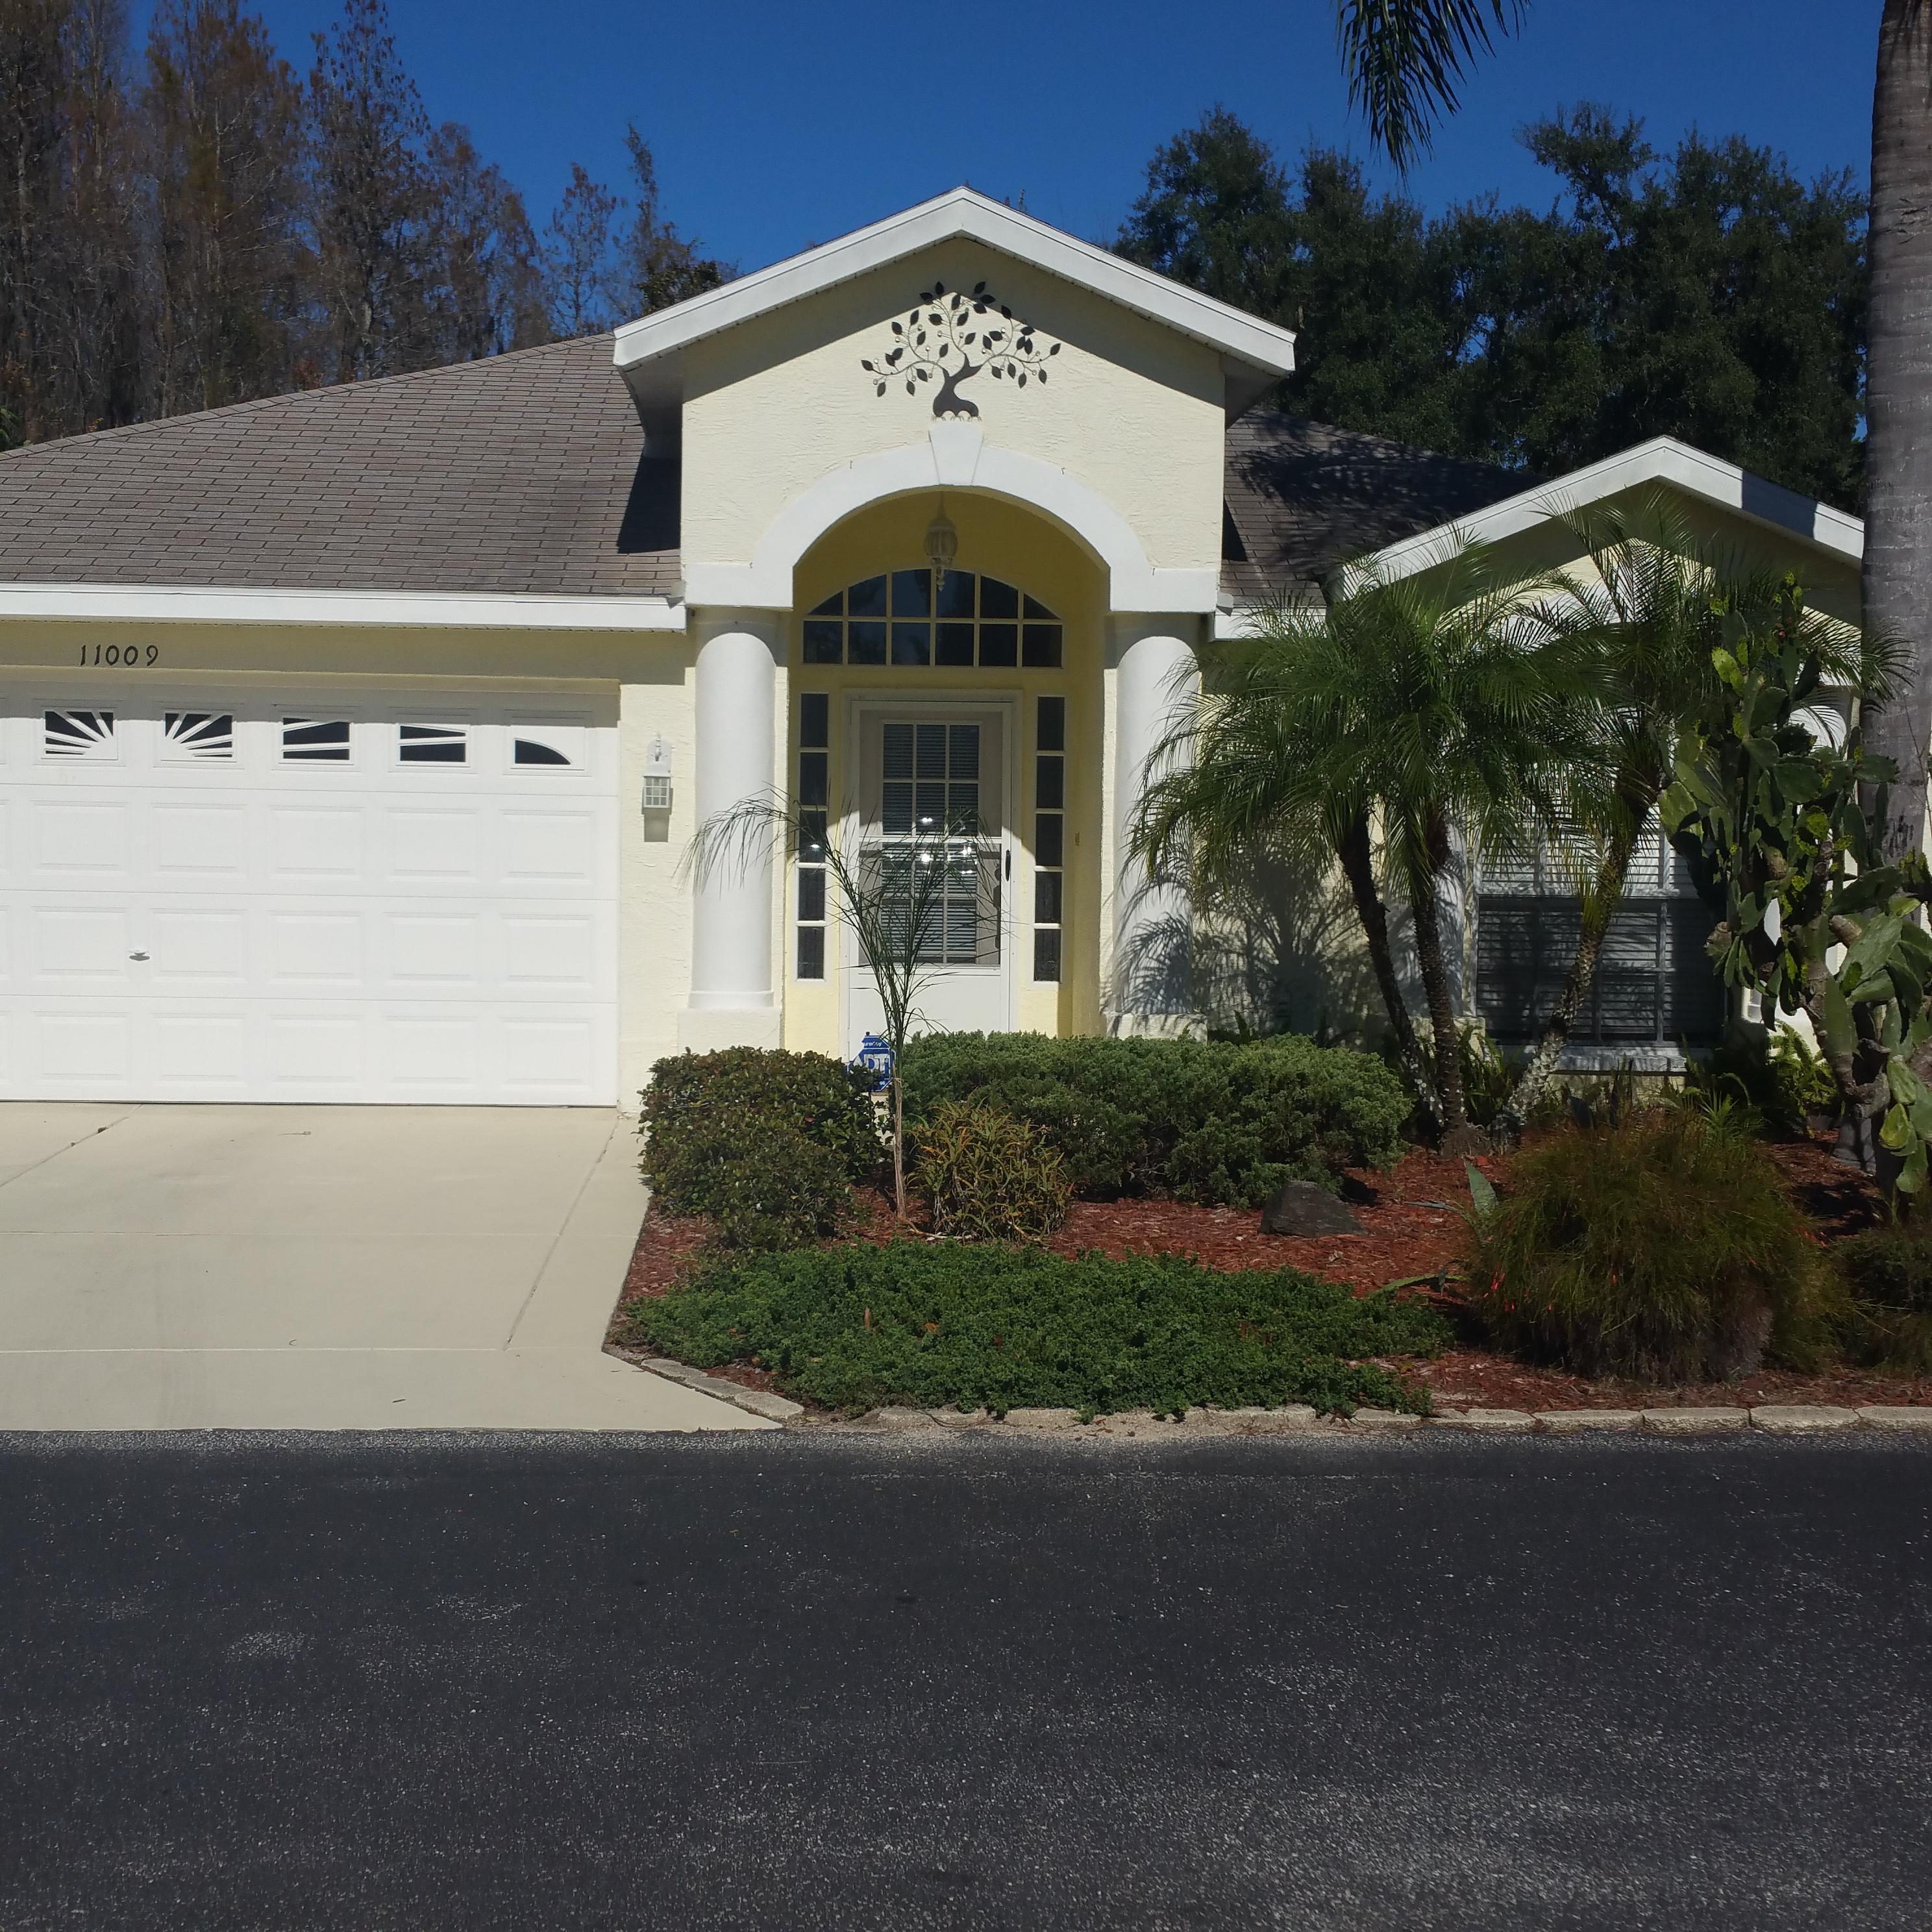 11009 millbury court, New Port Richey, Florida 34654